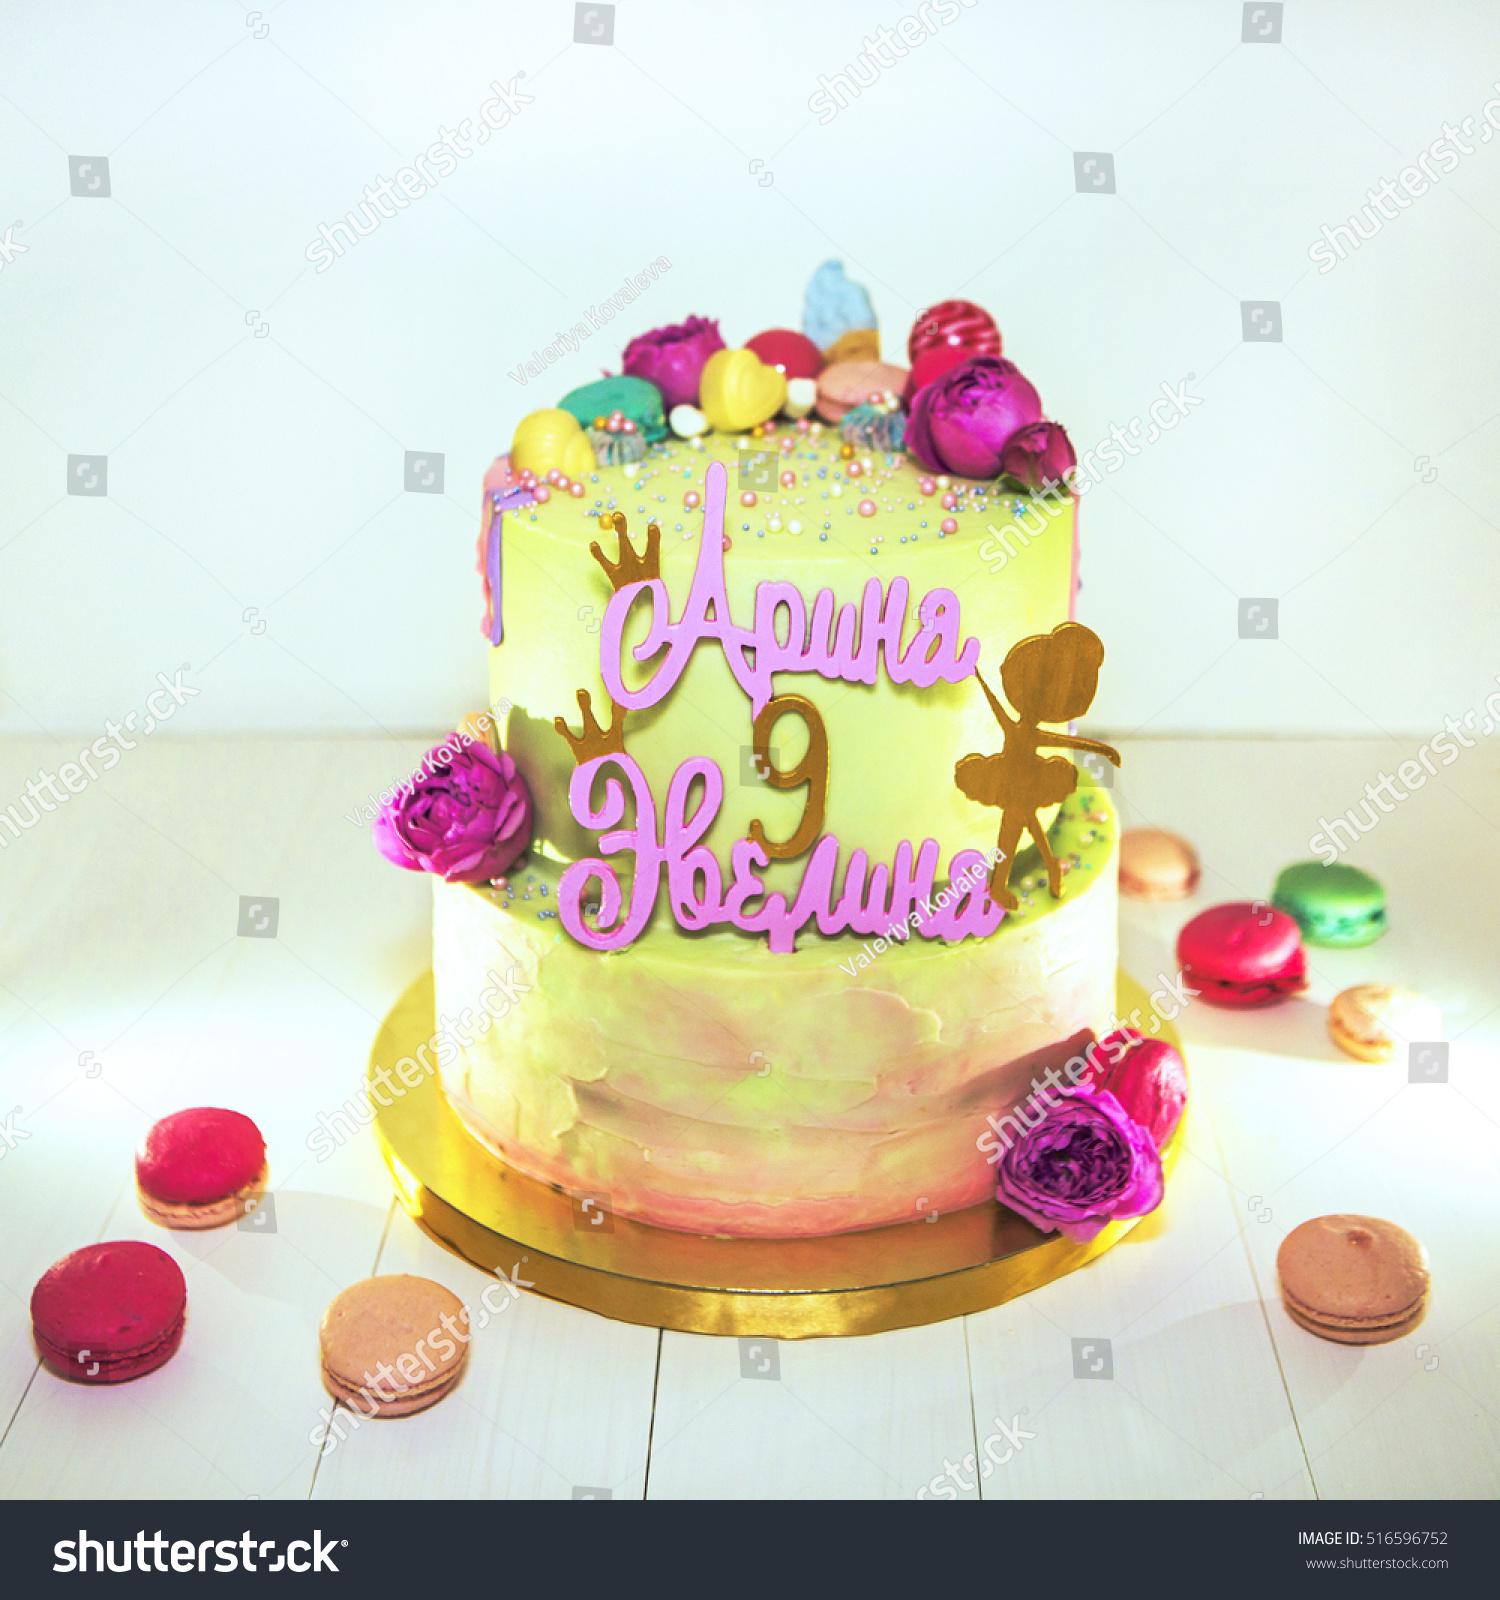 Girls Birthday Cake Birthday Cake Girls Birthday Bright Gentle Stockfoto Jetzt